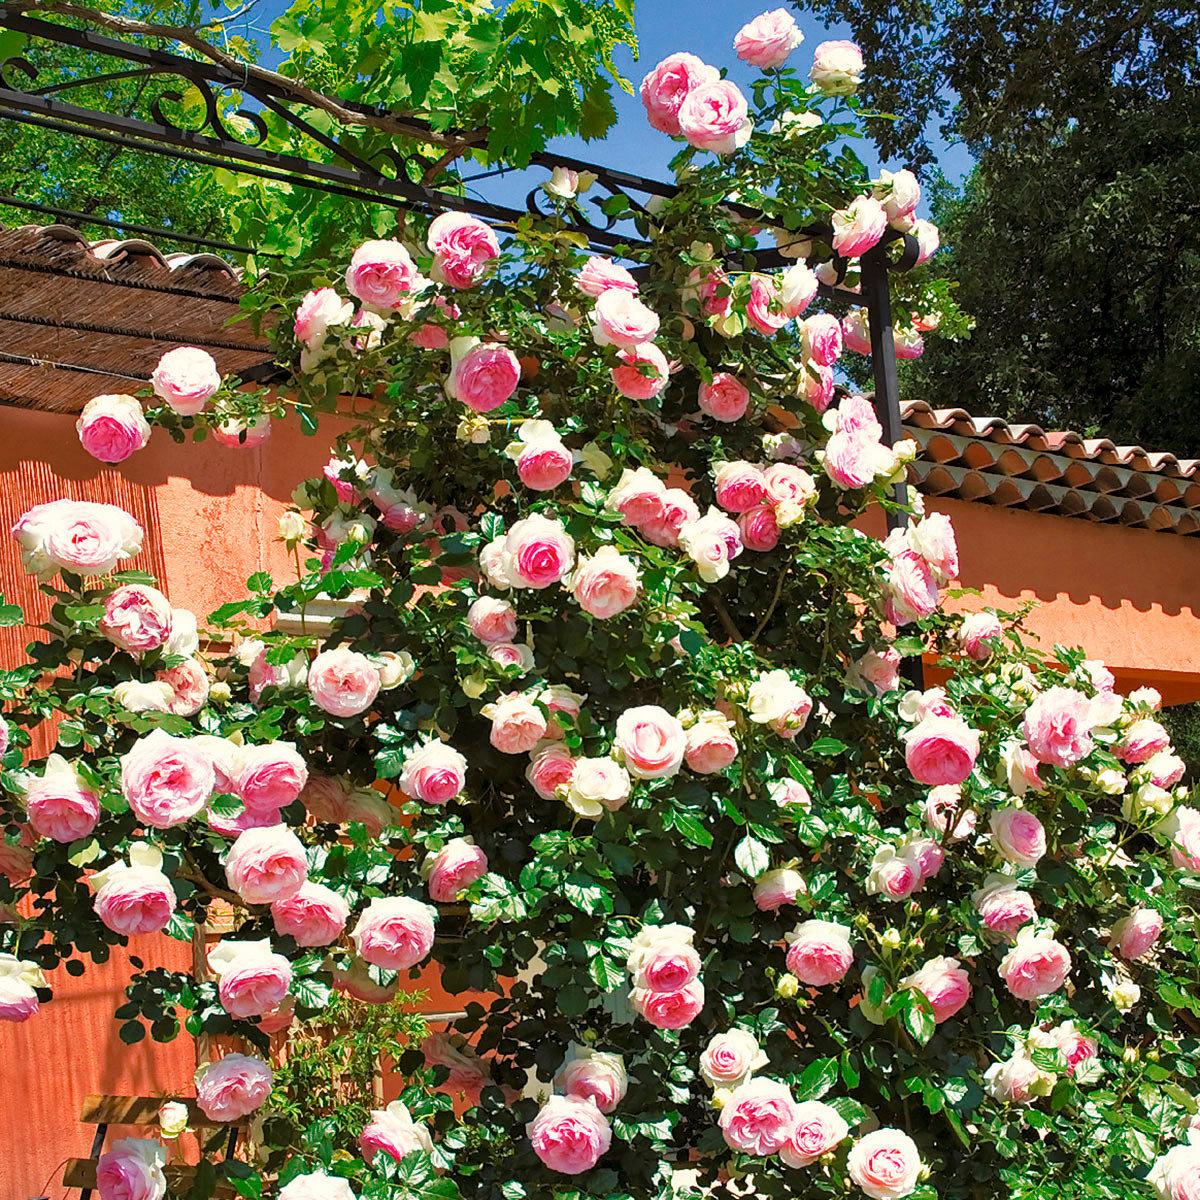 rose eden rose im 5 5 liter topf von g rtner p tschke. Black Bedroom Furniture Sets. Home Design Ideas